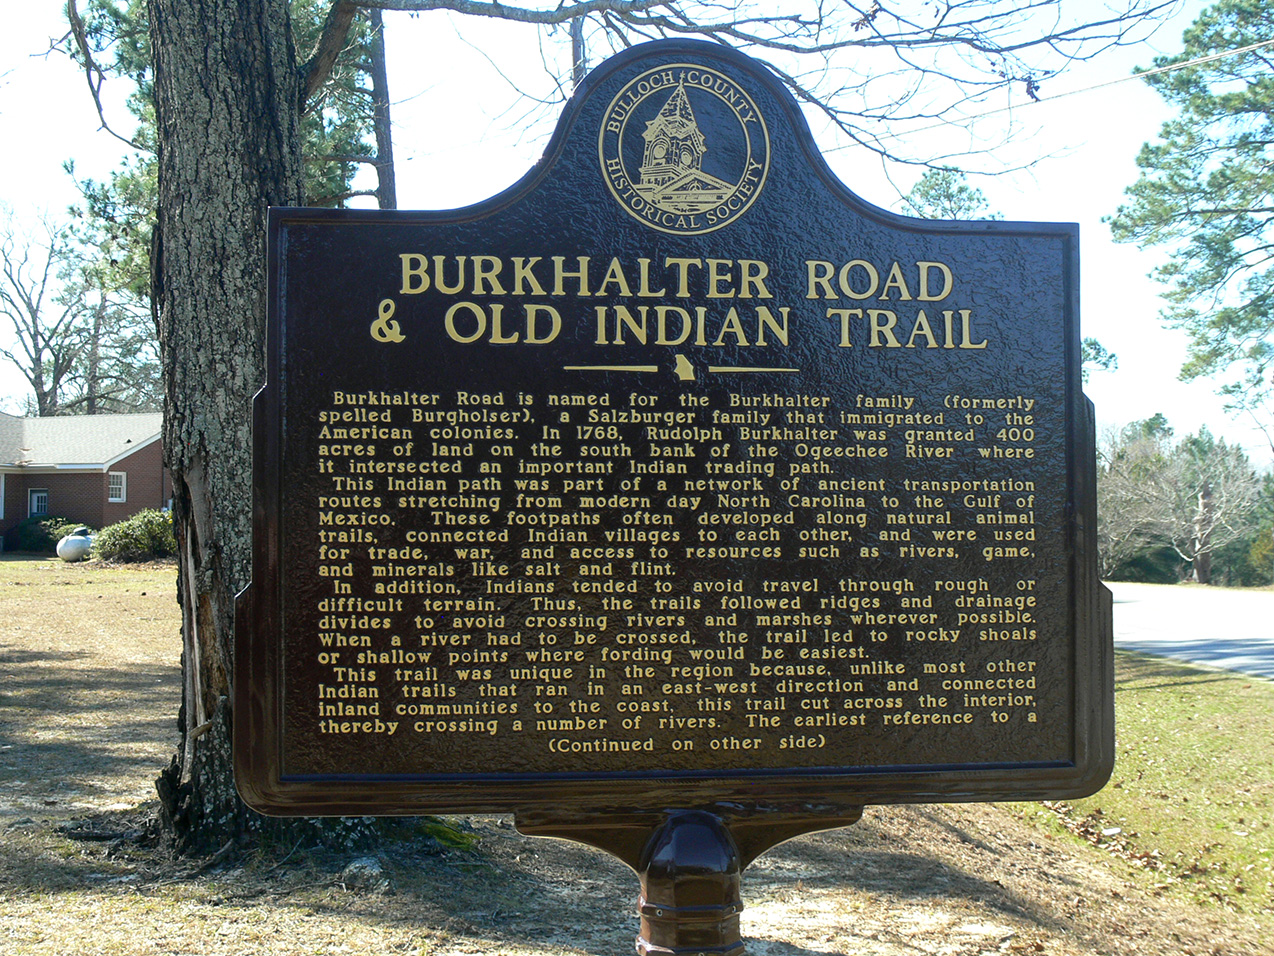 Burkhalter Road & Old Indian Trail